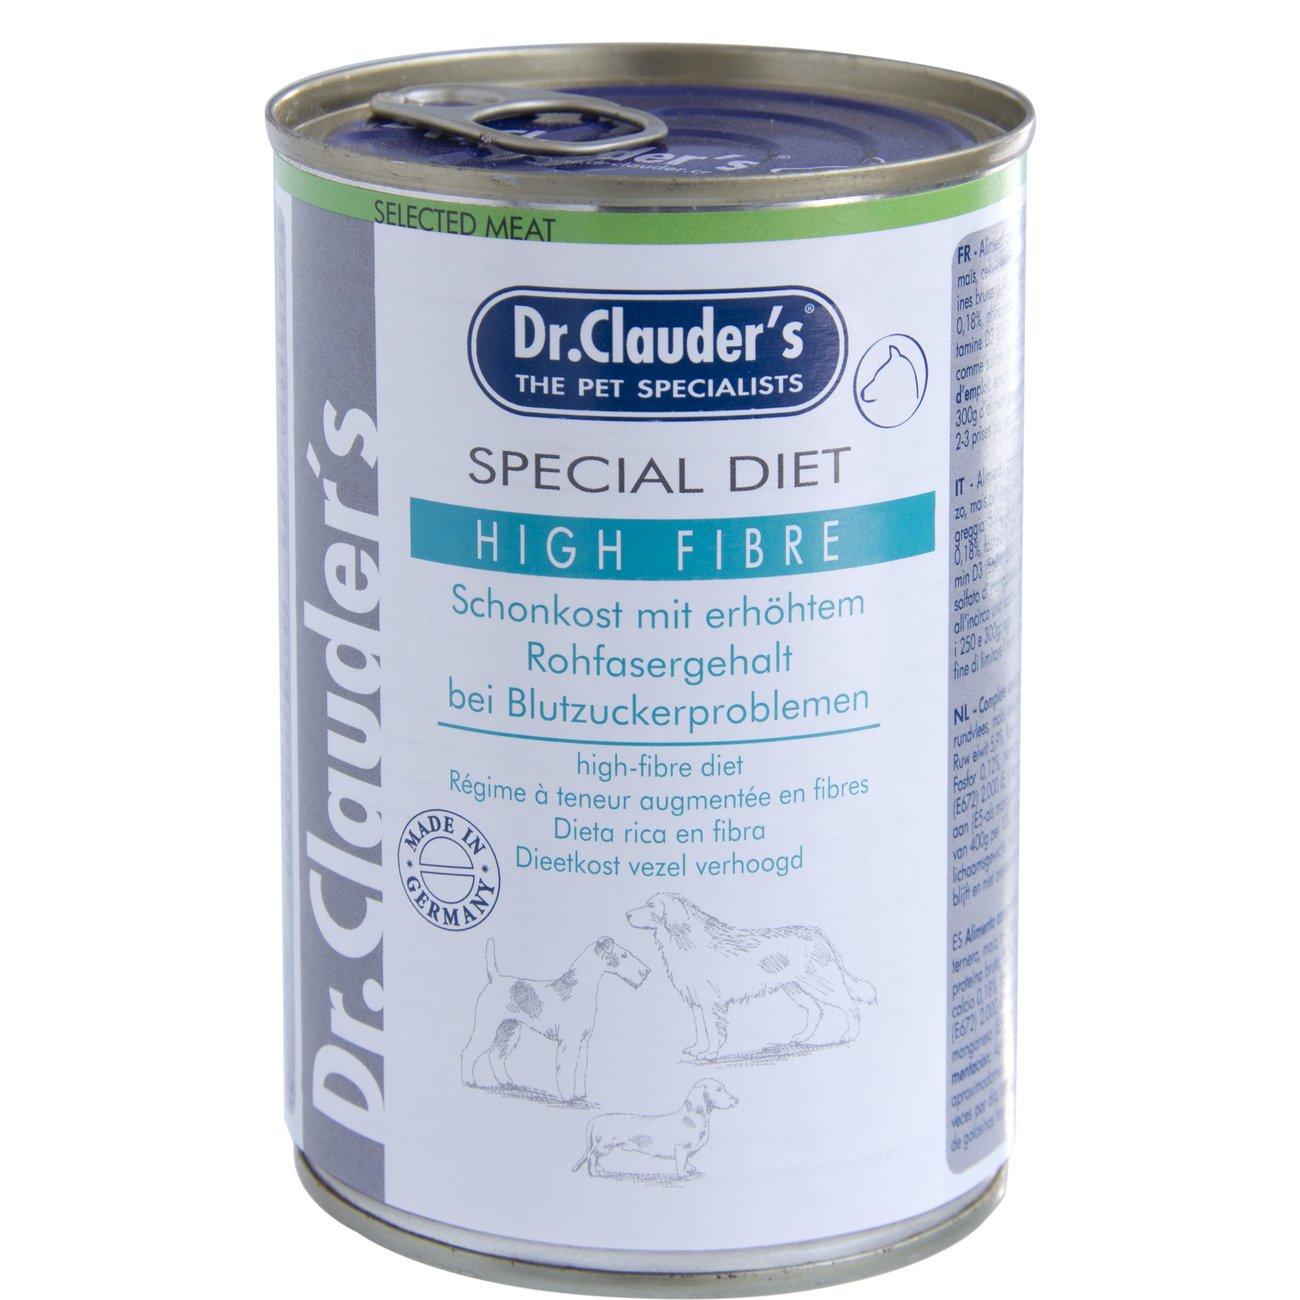 Dr. Clauders Special Diet Diät Schonkost Hundefutter, Bild 2